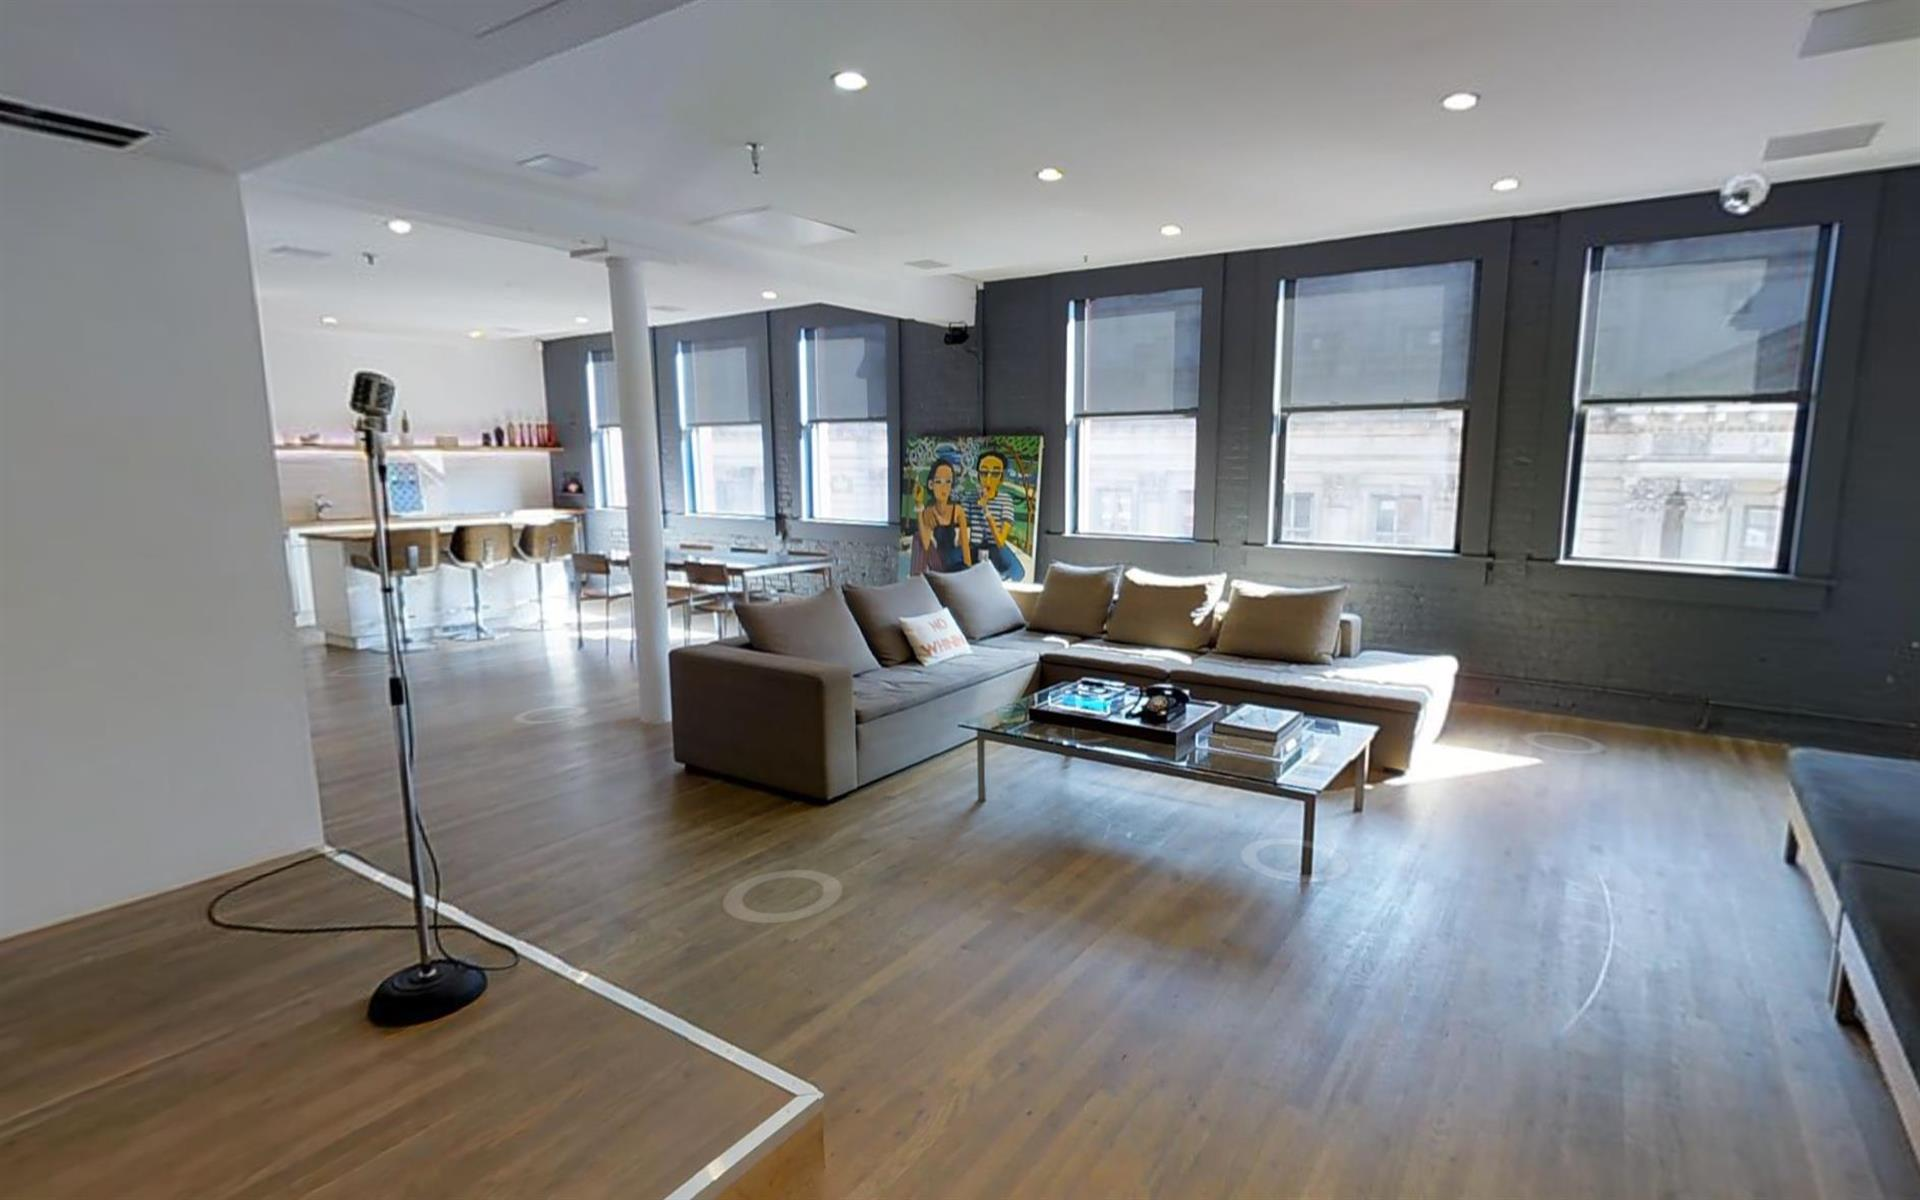 Cliqk Soho Meeting & Event Spaces - Smart Soho Loft on Centre Street